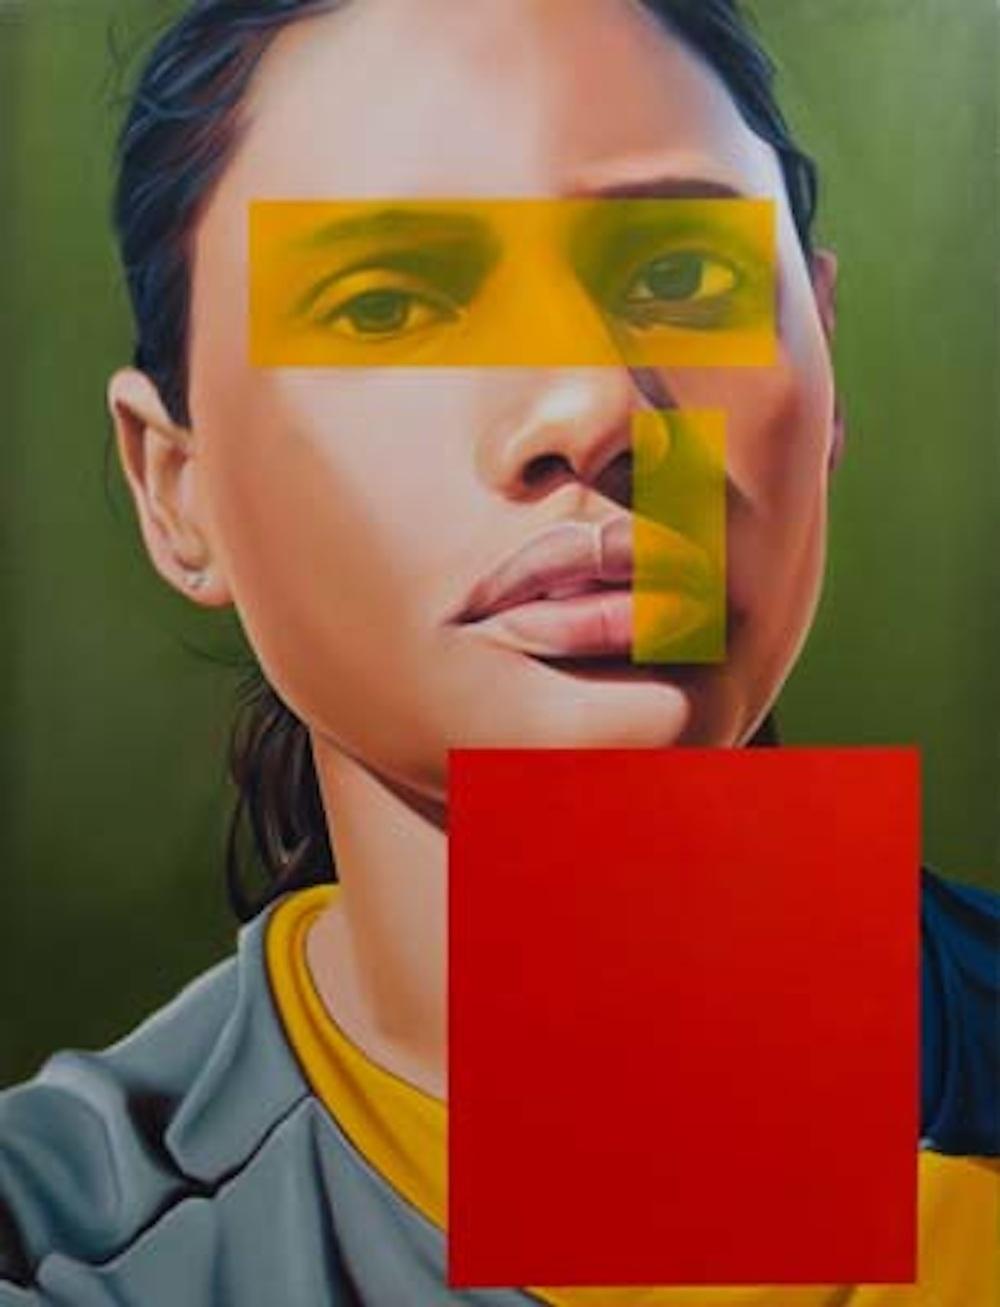 Art13 London. Sumukha Gallery. Riyas Komu Woman Footballer, Oil on Canvas Size 78 x 60 Ins